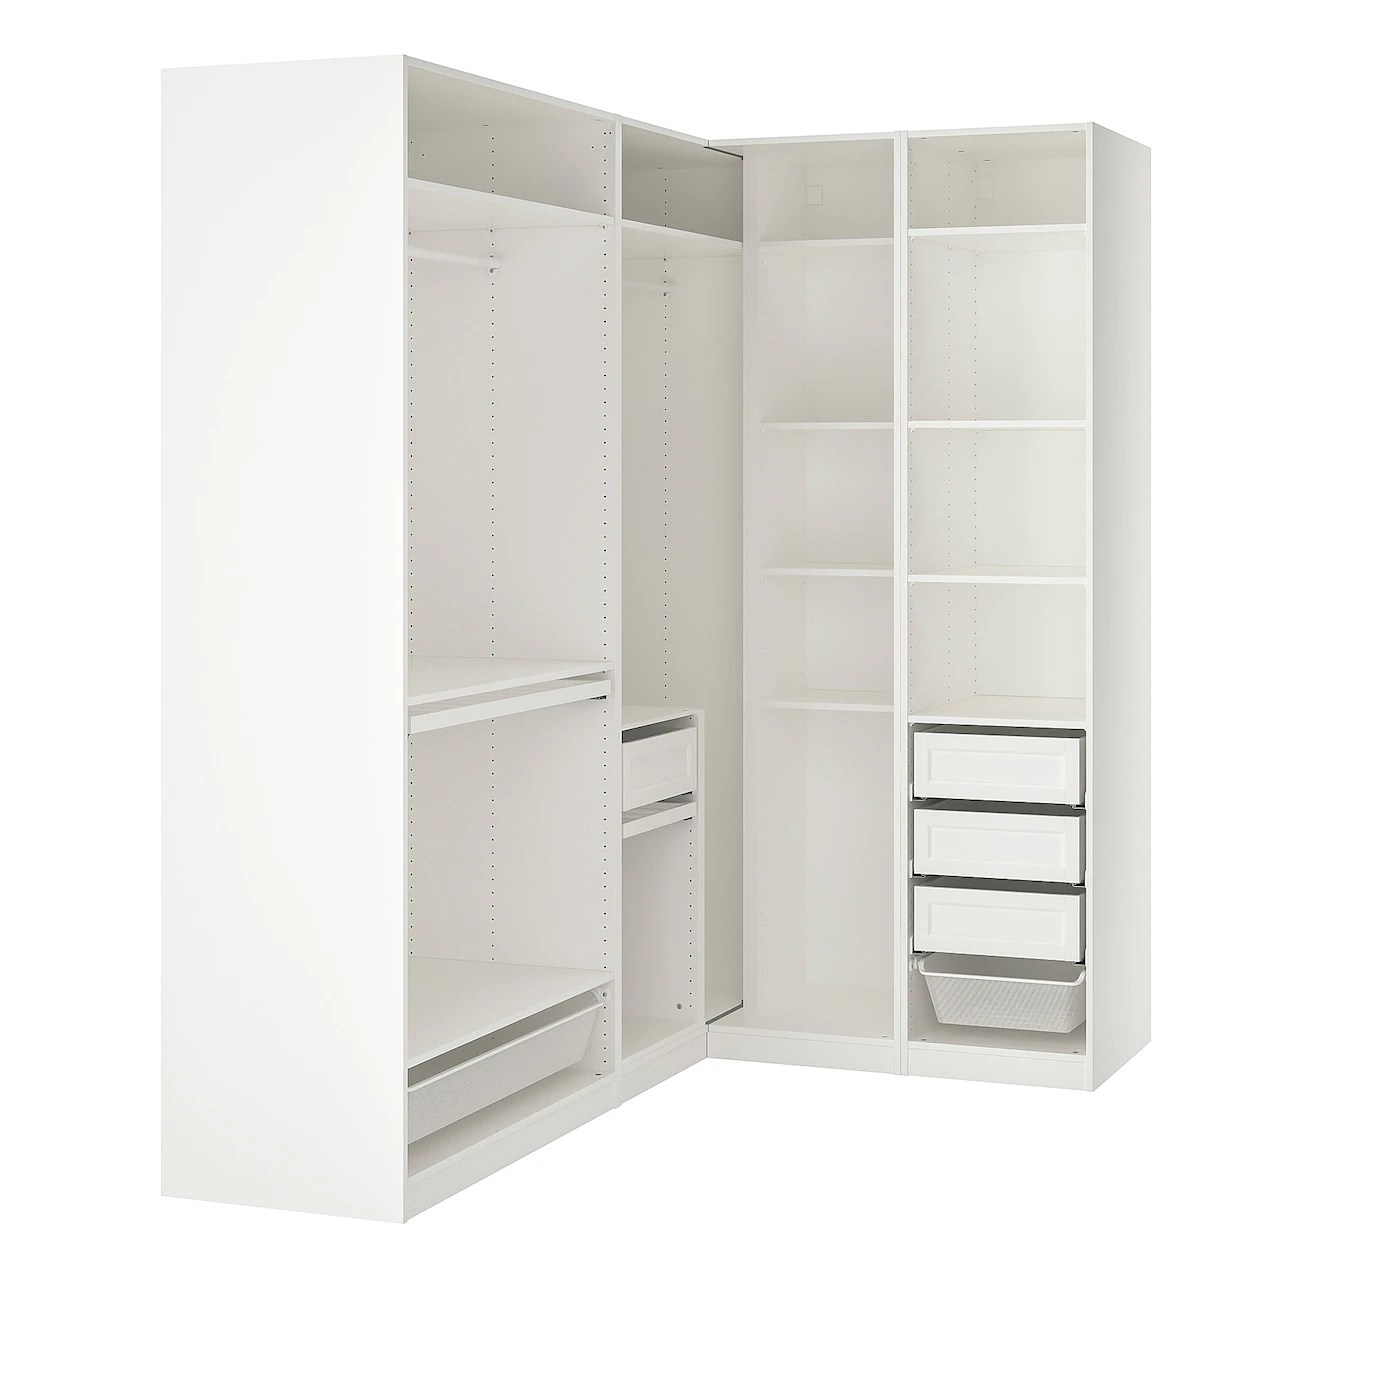 pax armoire d angle blanc 210 160x236 cm